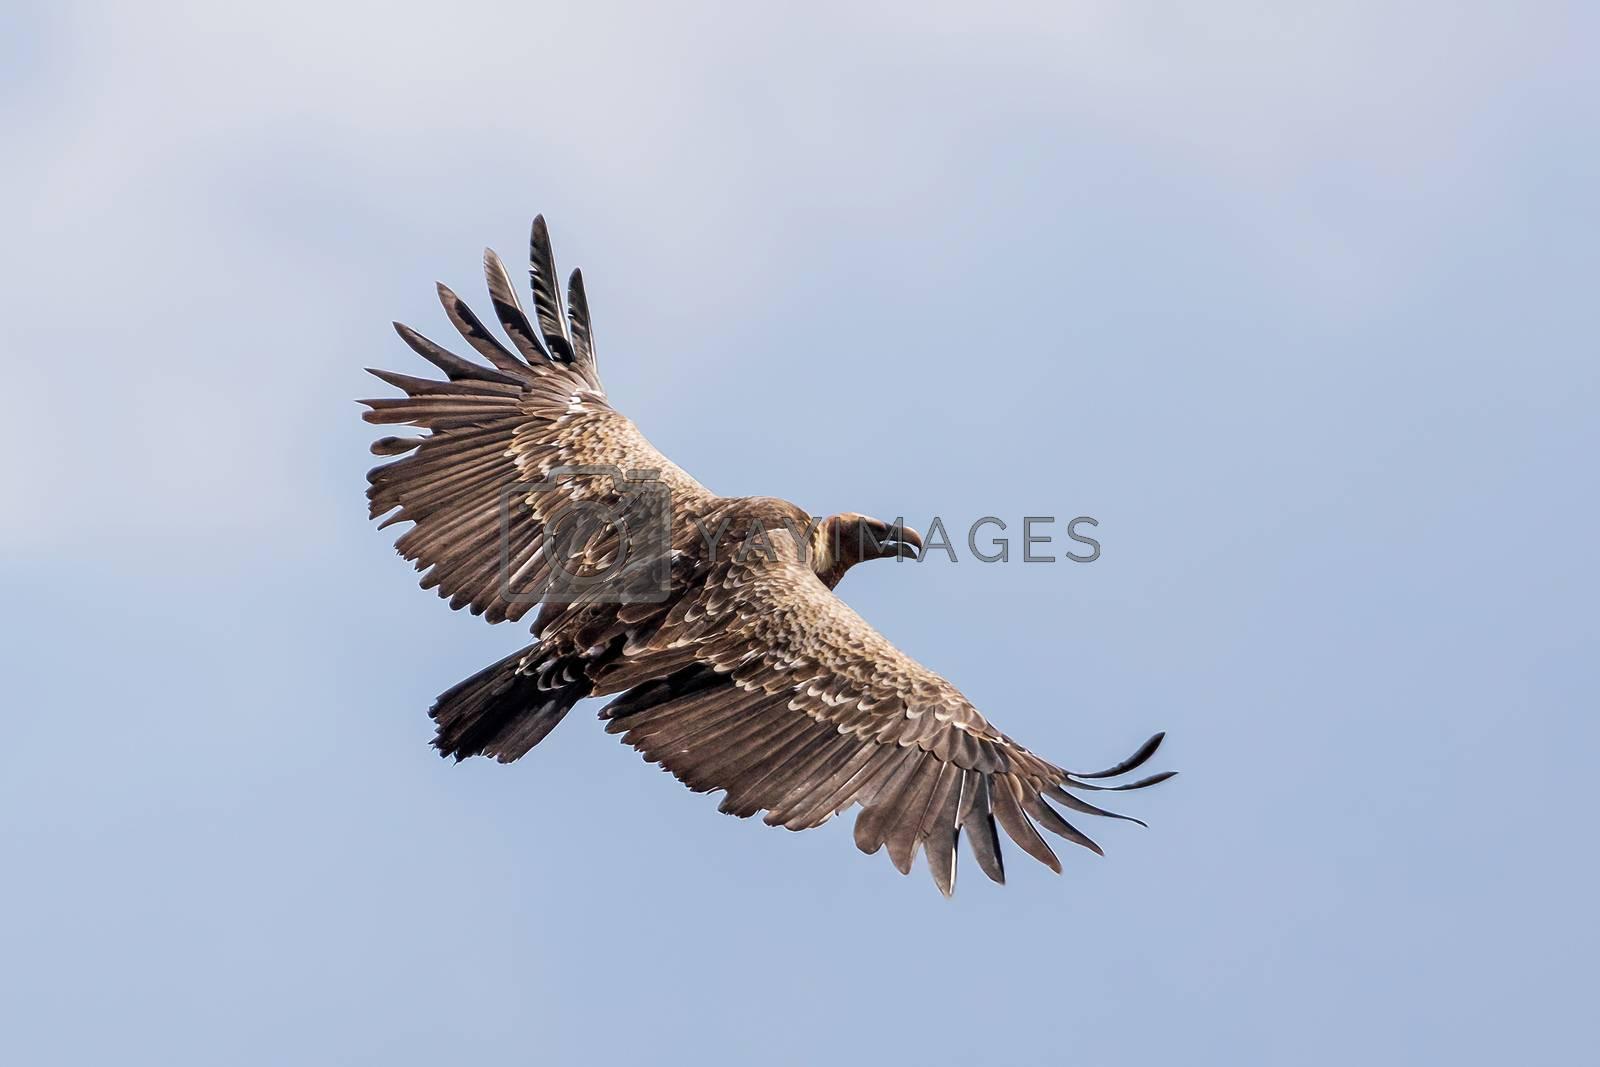 Griffon Vulture in flight against sky. Bird in Ethiopia, Africa wildlife